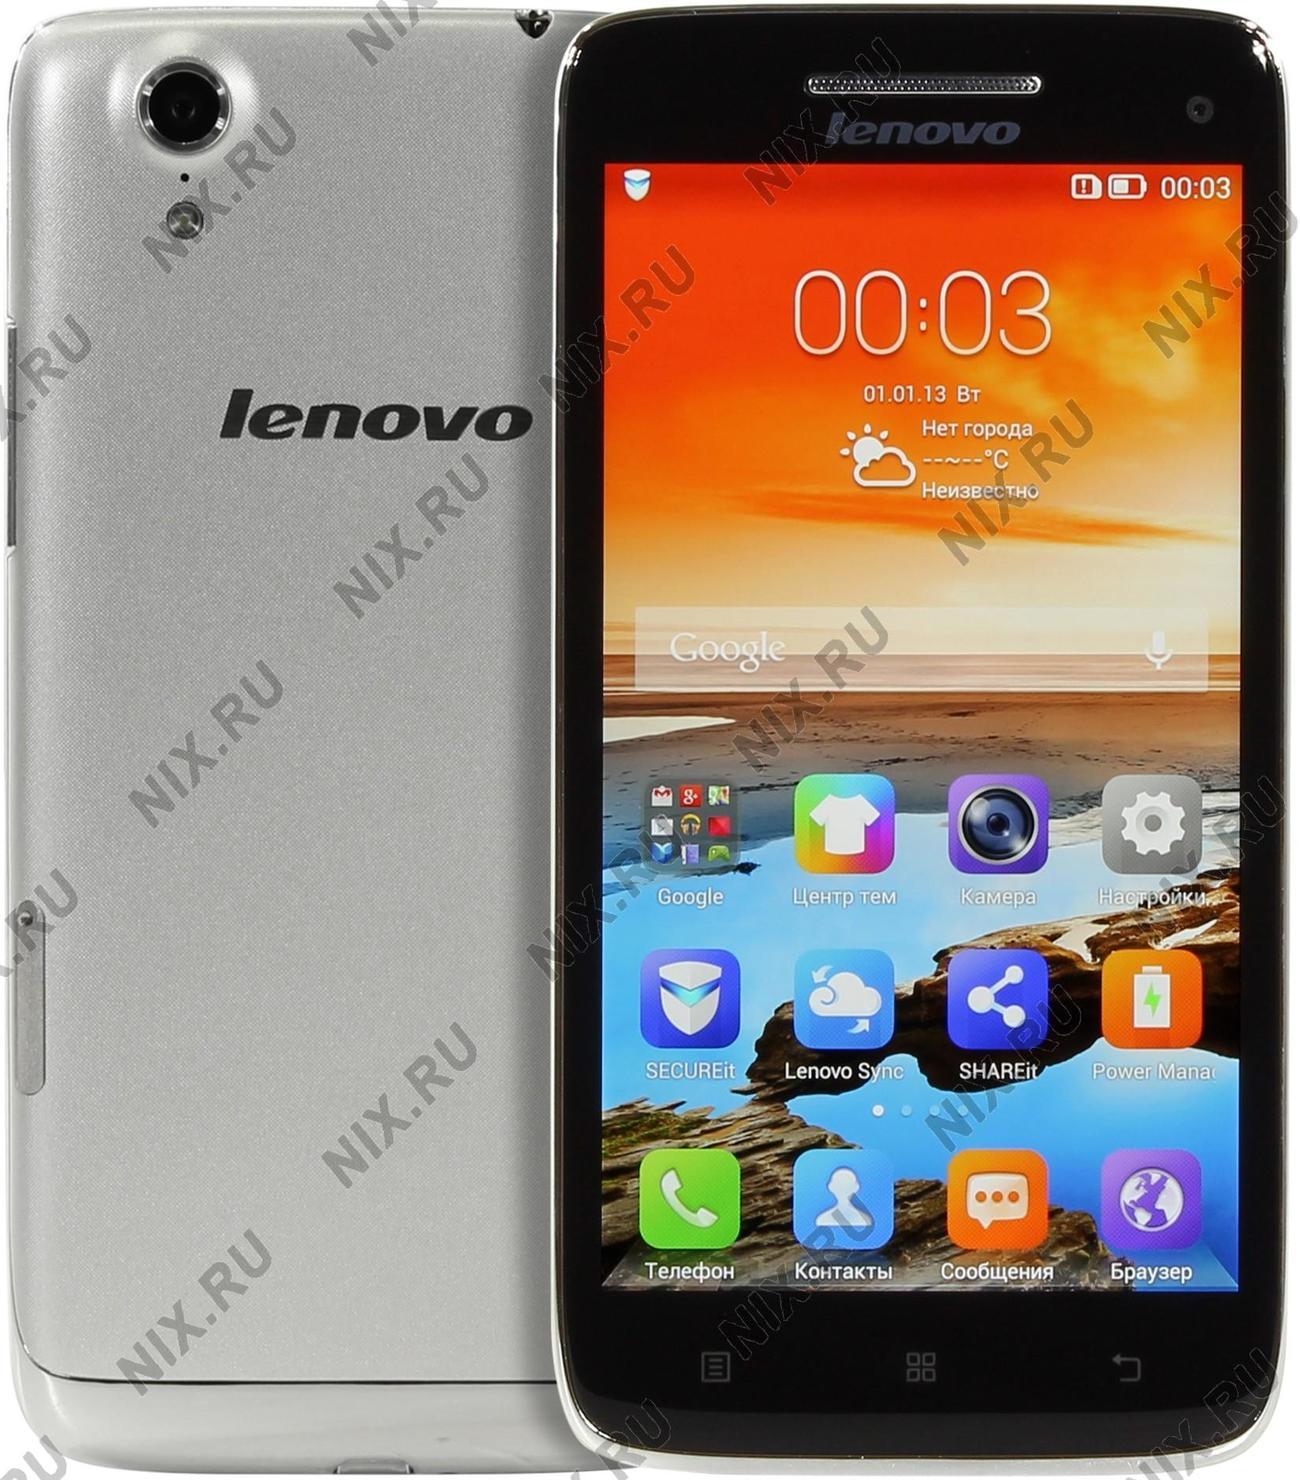 Lenovo Vibe X S960 With Corning Gorilla Glass